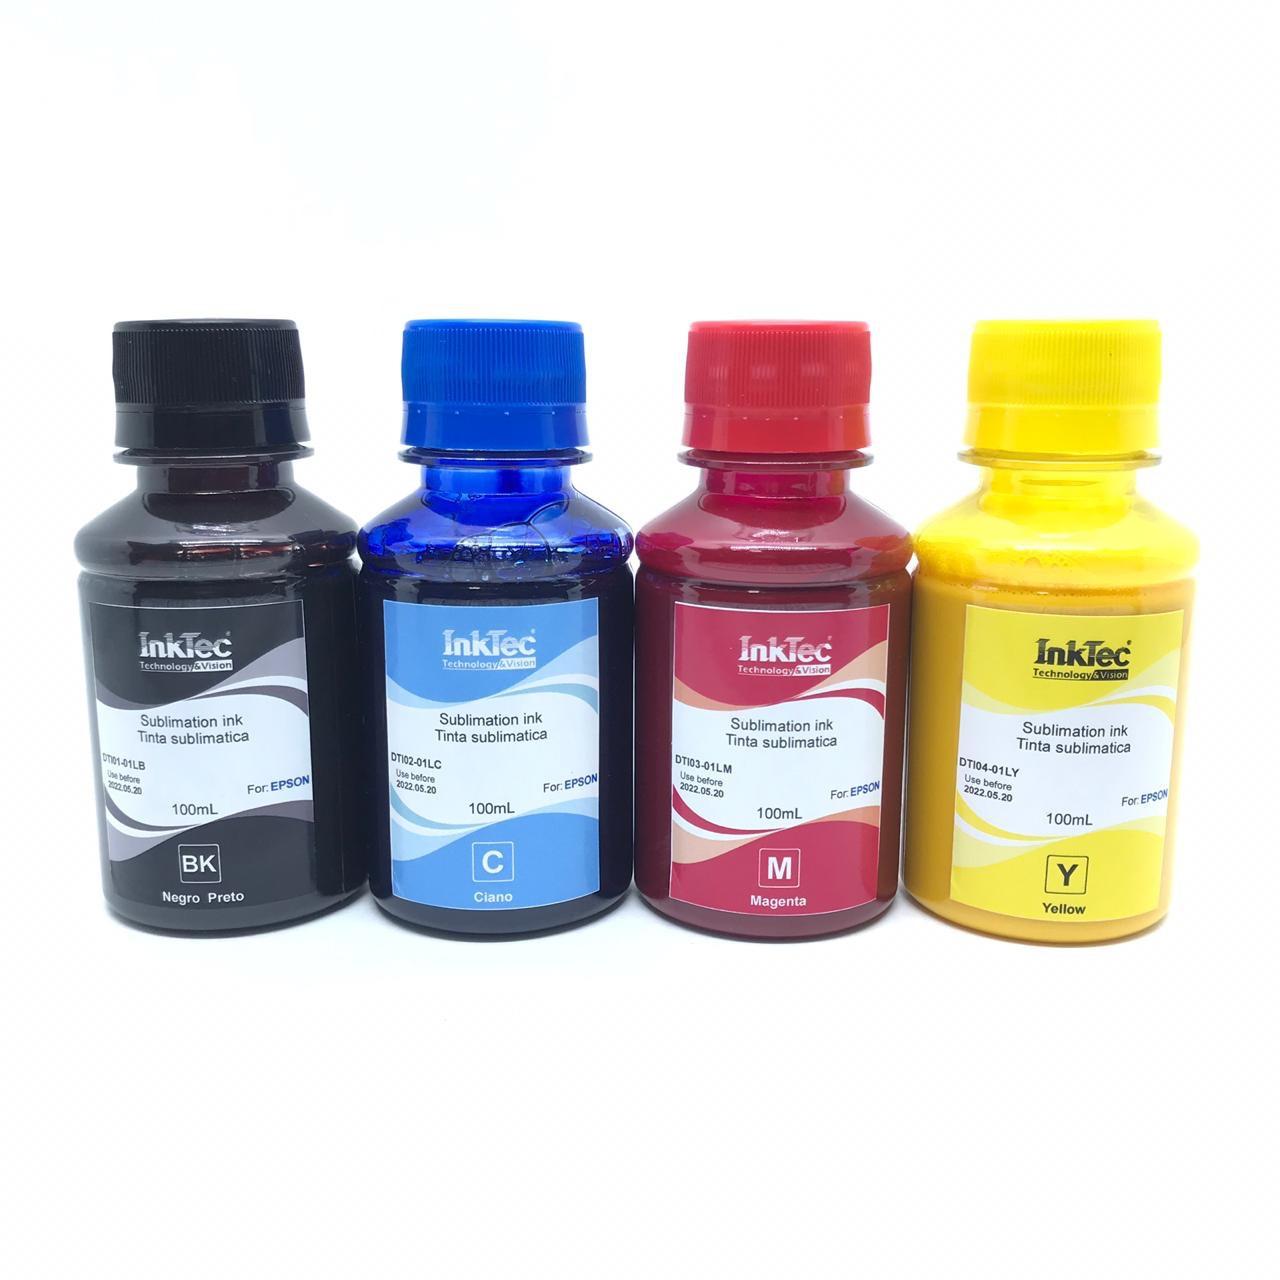 Kit Tinta Sublimática 400 ml Inktec + Papel Sublimatico A3 100 Folhas